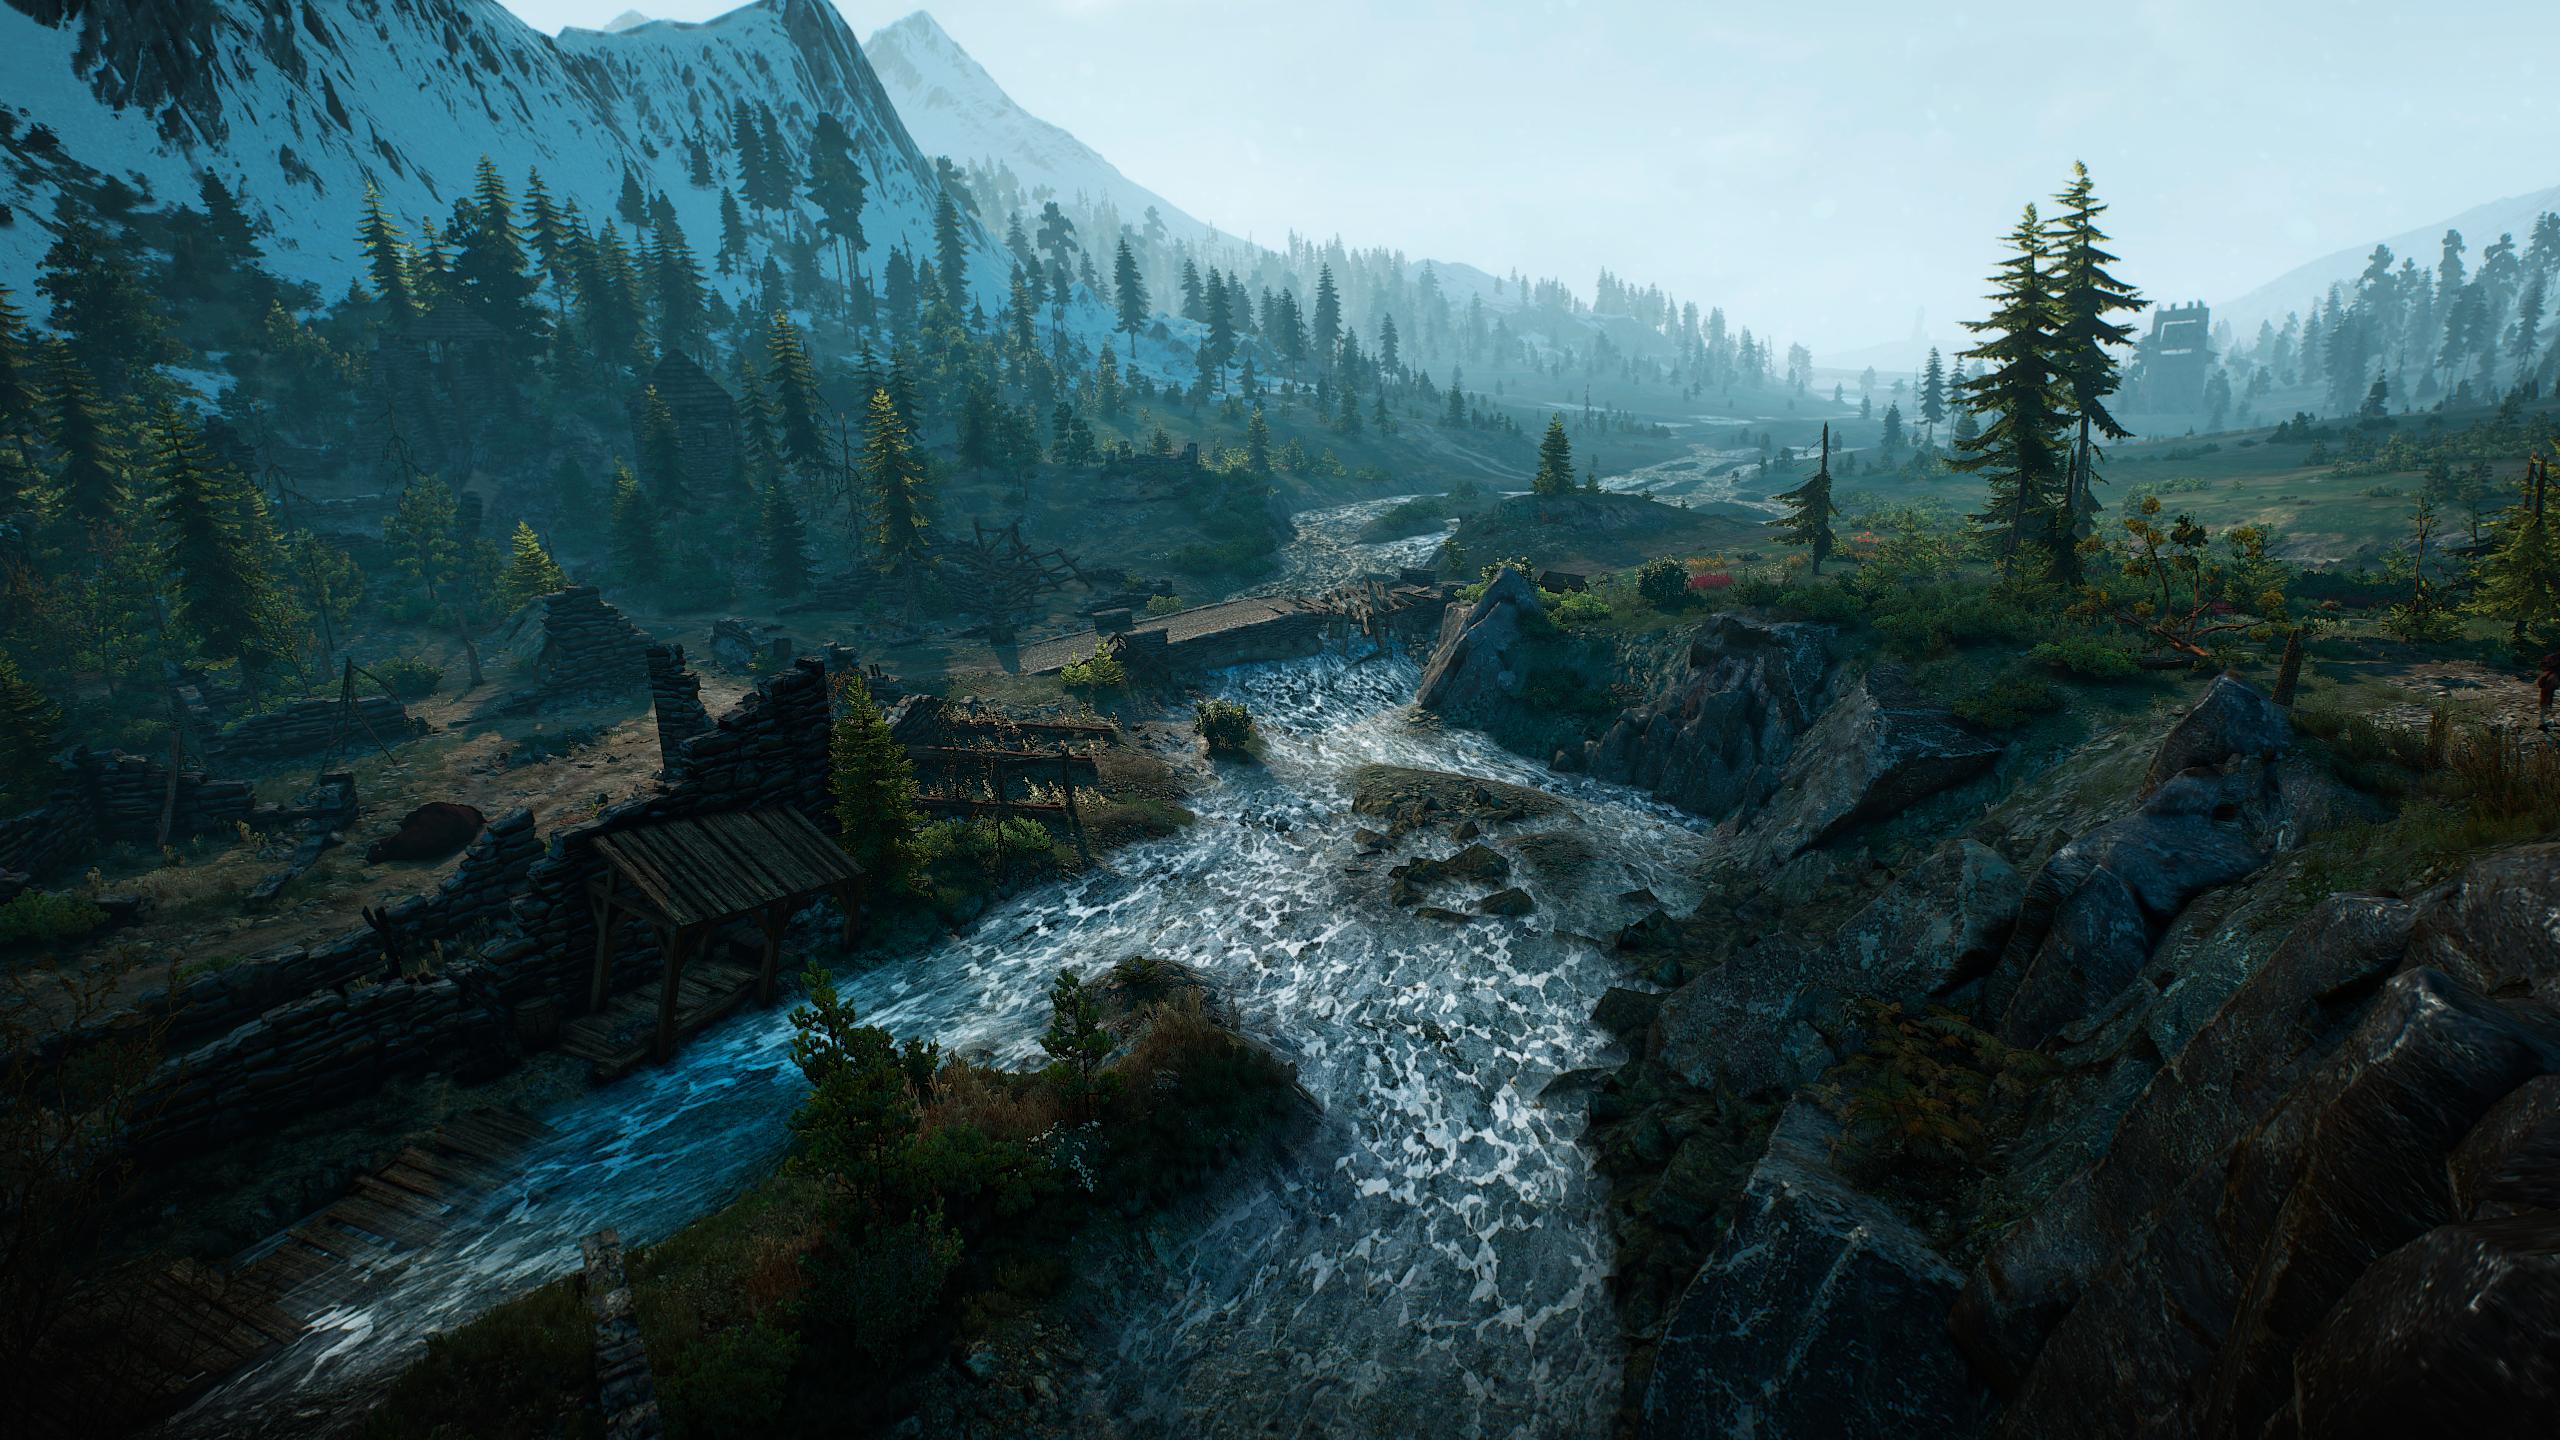 General 2560x1440 landscape video game art video games screen shot The Witcher 3: Wild Hunt